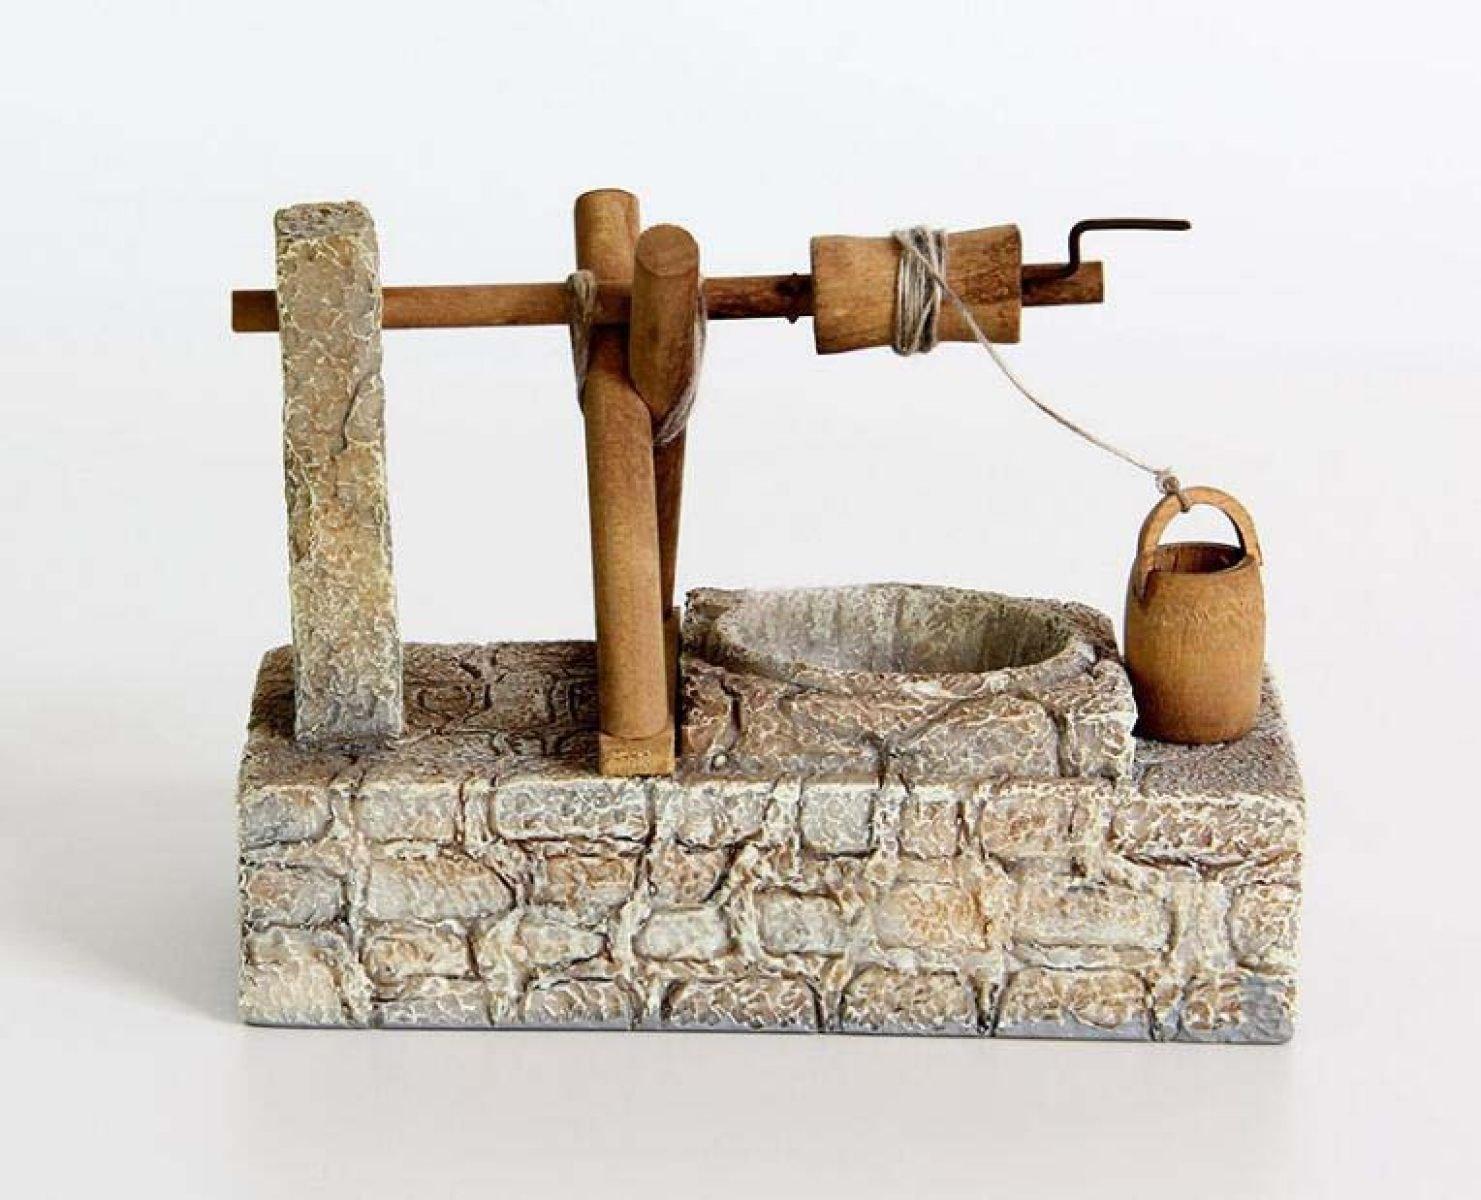 Crafts Reel Reel Model Mini Farm Tools Features Ornaments Nostalgic Crafts To Send Children Gifts Garden Ornaments